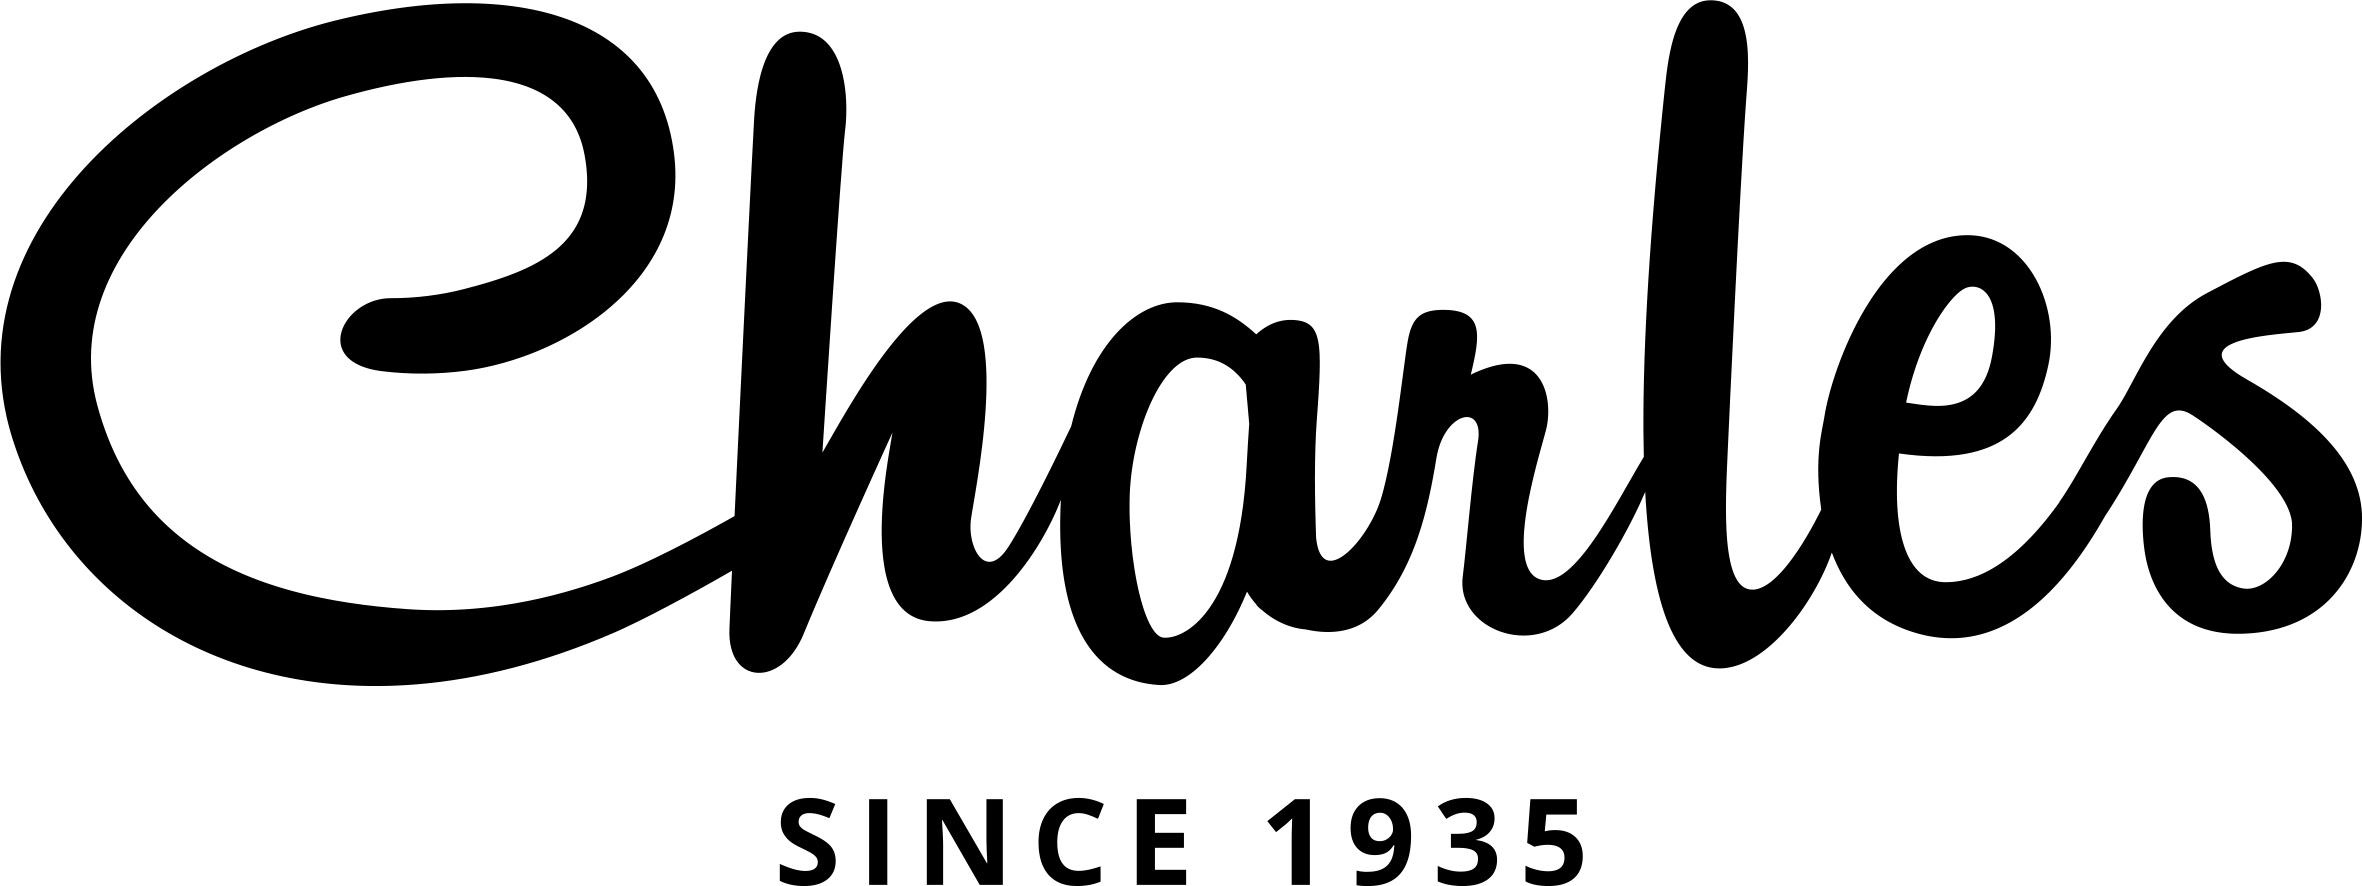 logo_Charles_black